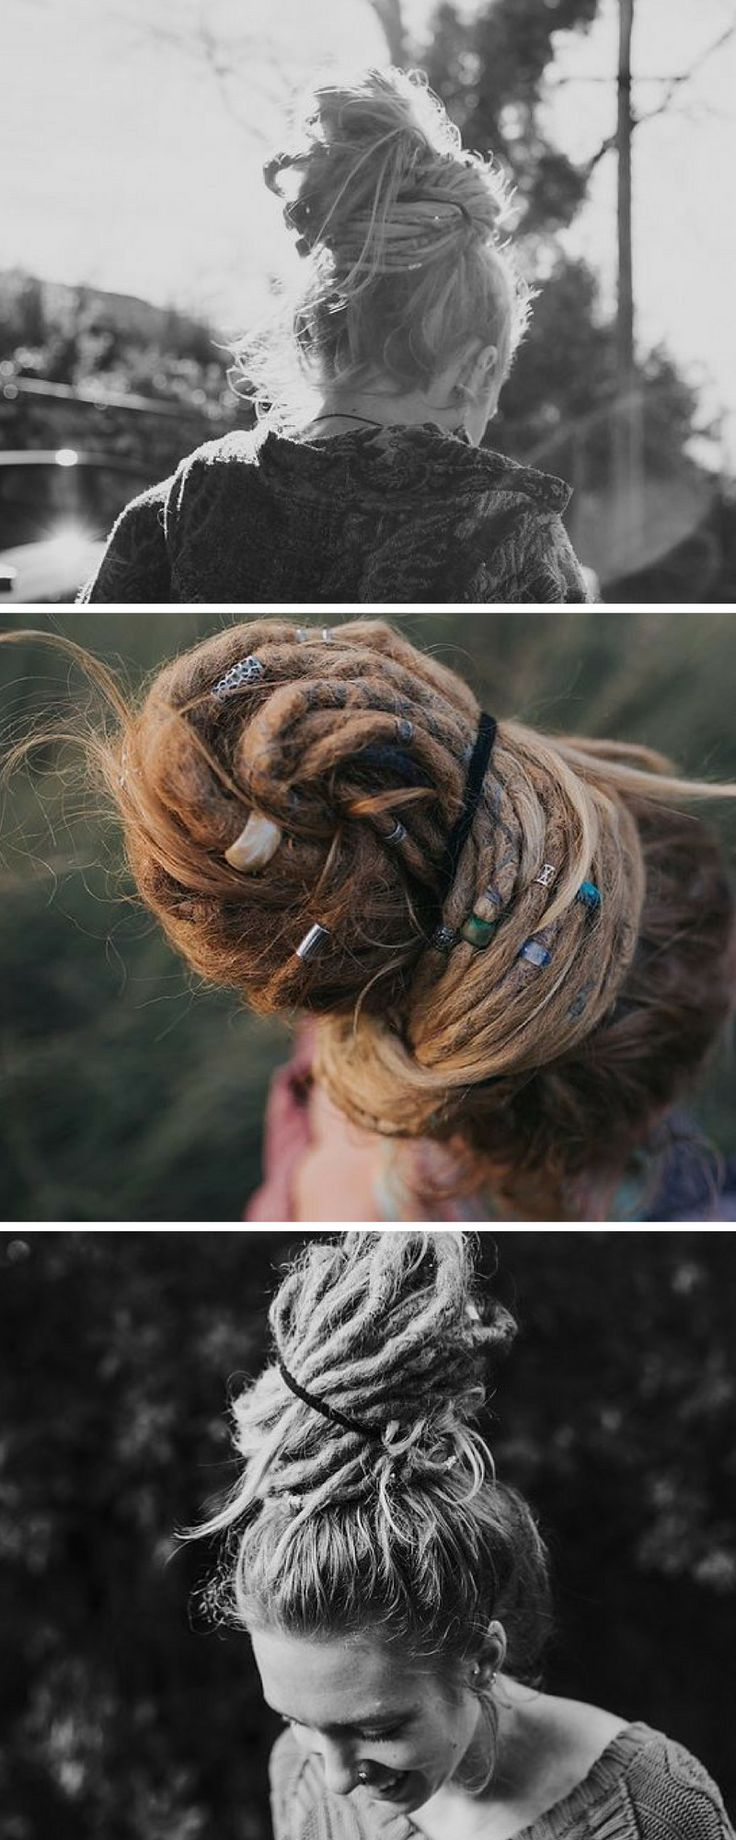 Dread bun Hairstyles  -  Dreadlock up do #dreadlockstyles #dreadlocks #dreads #Dreadbun #dreadbeads #dreadlockupdo mountaindreads.com